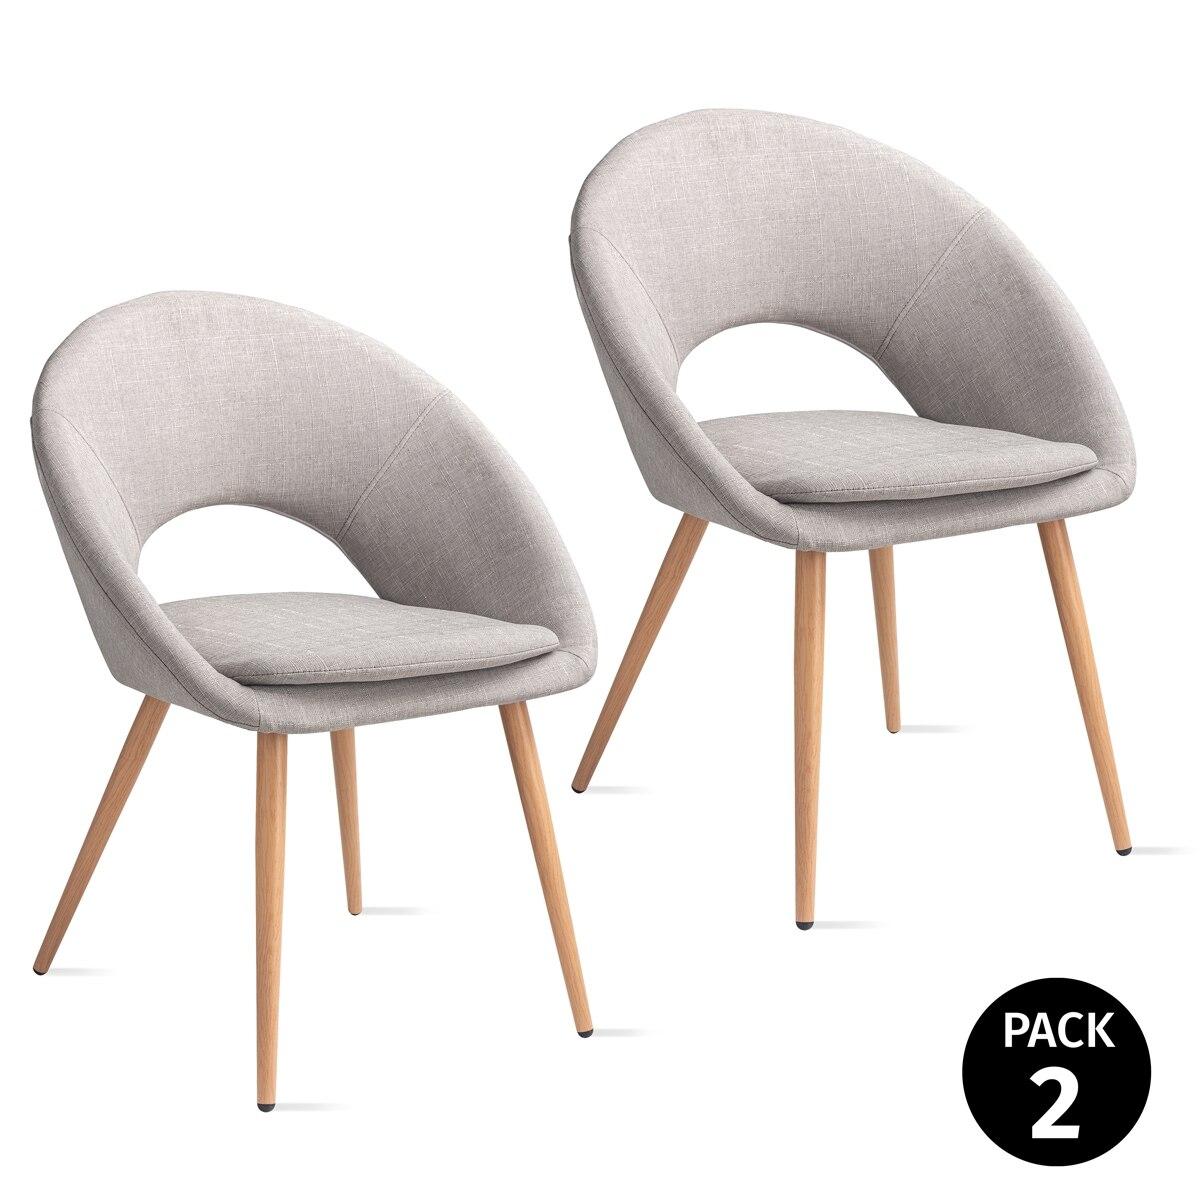 Mc Haus-Pack 2 Chairs LAGUNA Nordico Grey Pearl Living Room 46x43x82cm